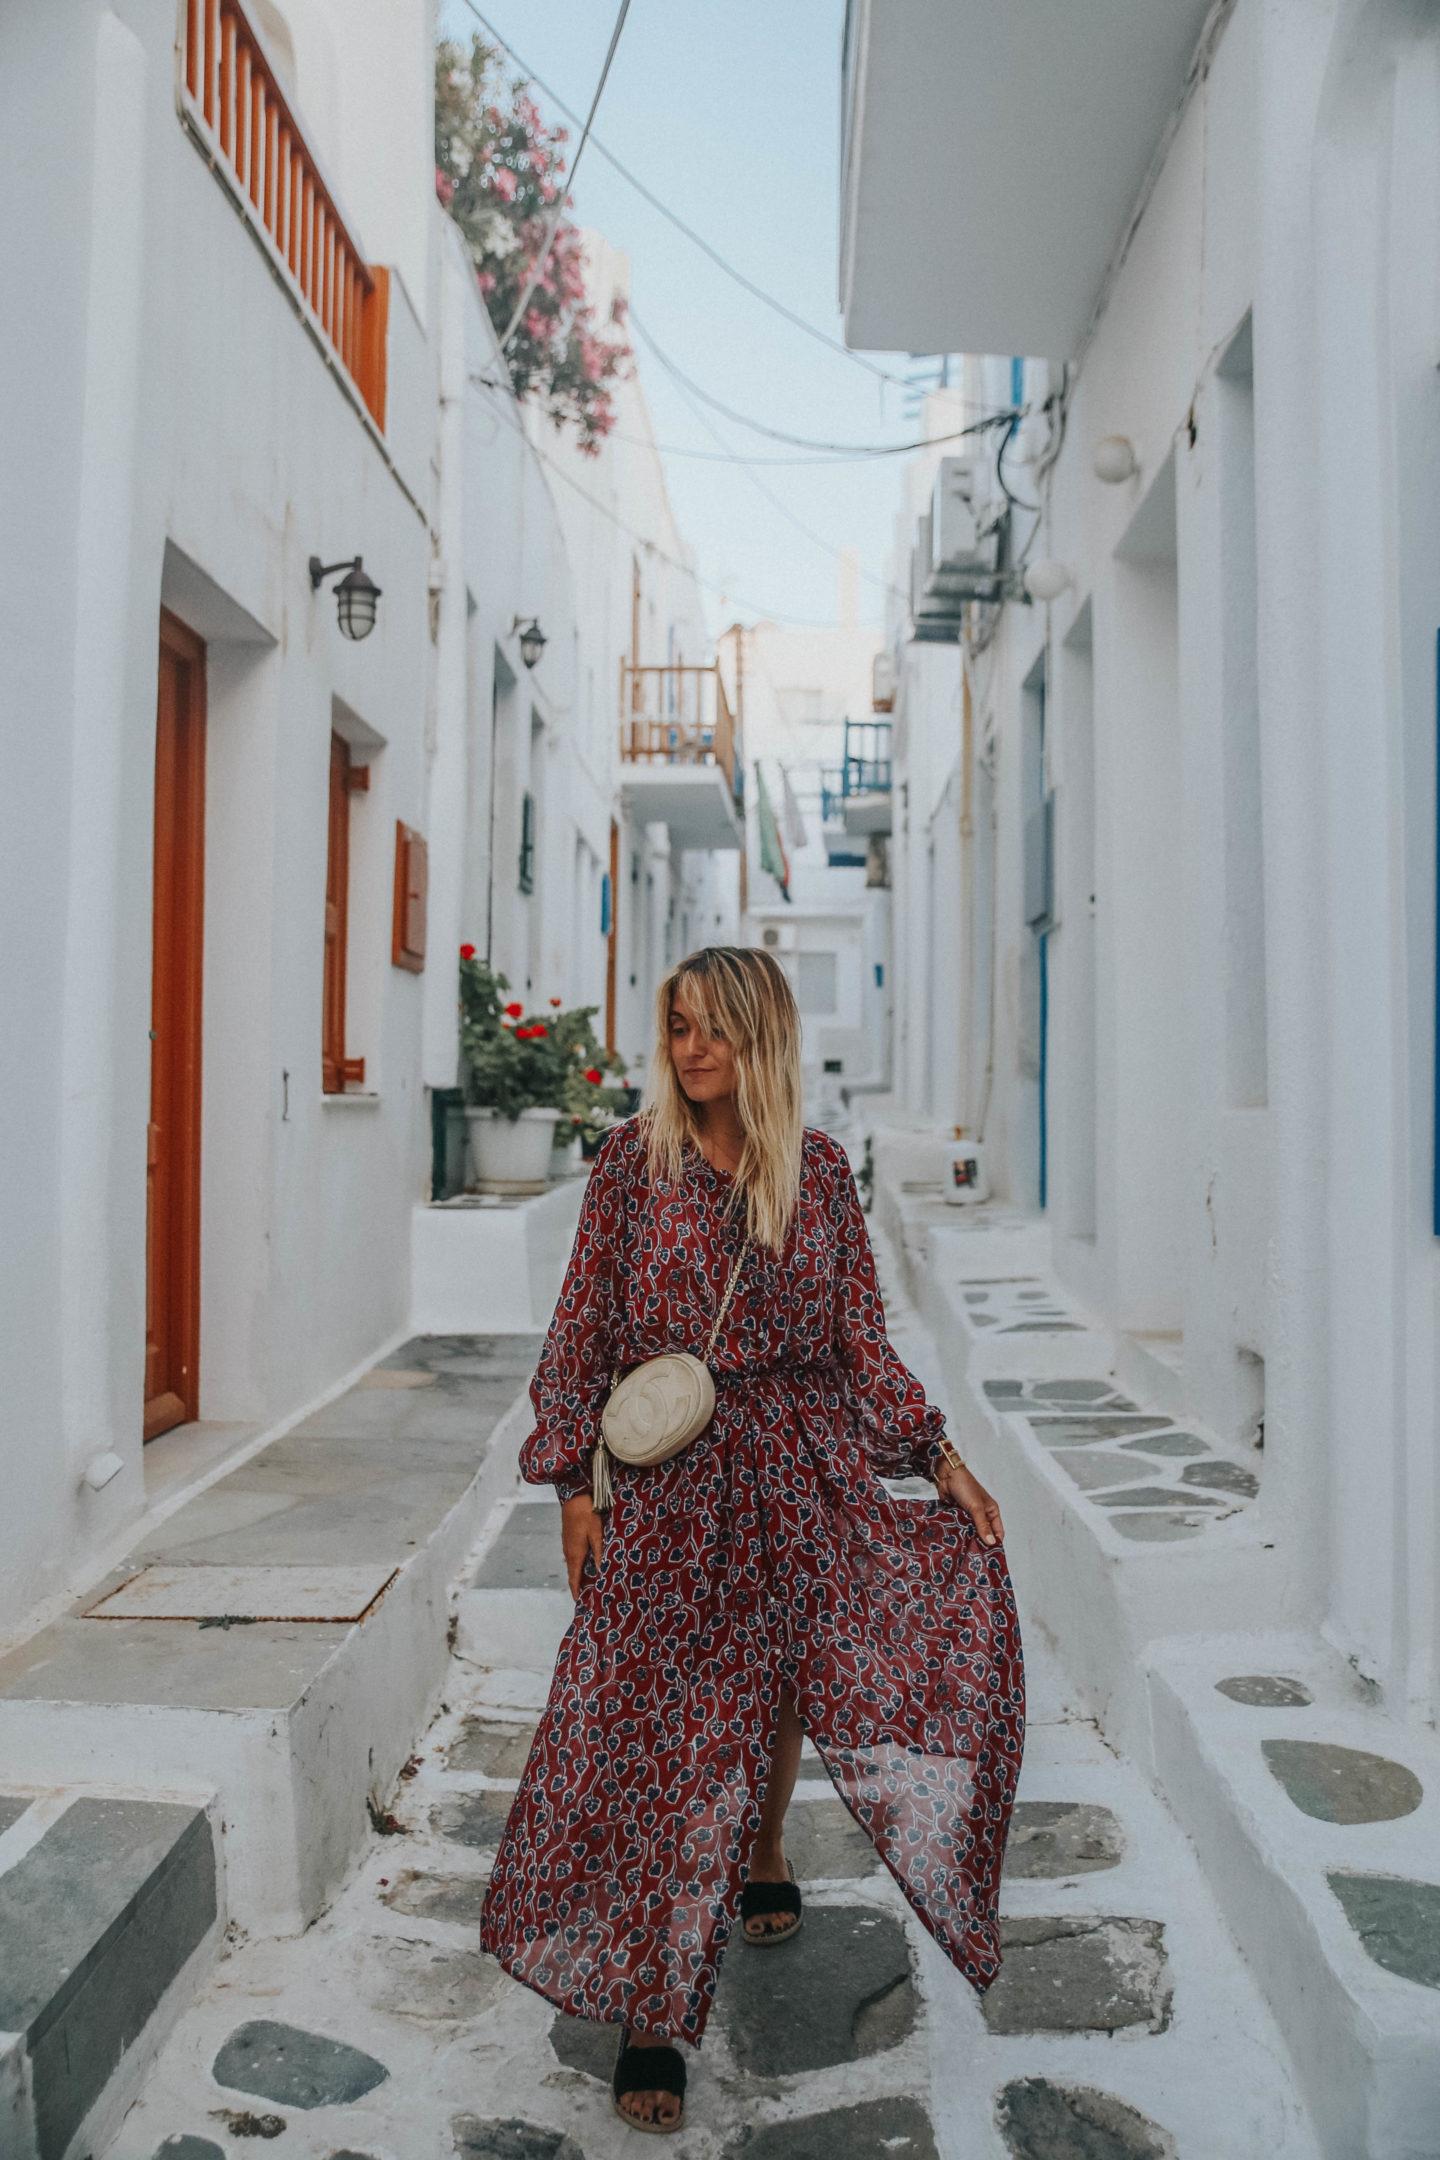 Sac Chanel vintage - Blondie Baby blog mode et voyages